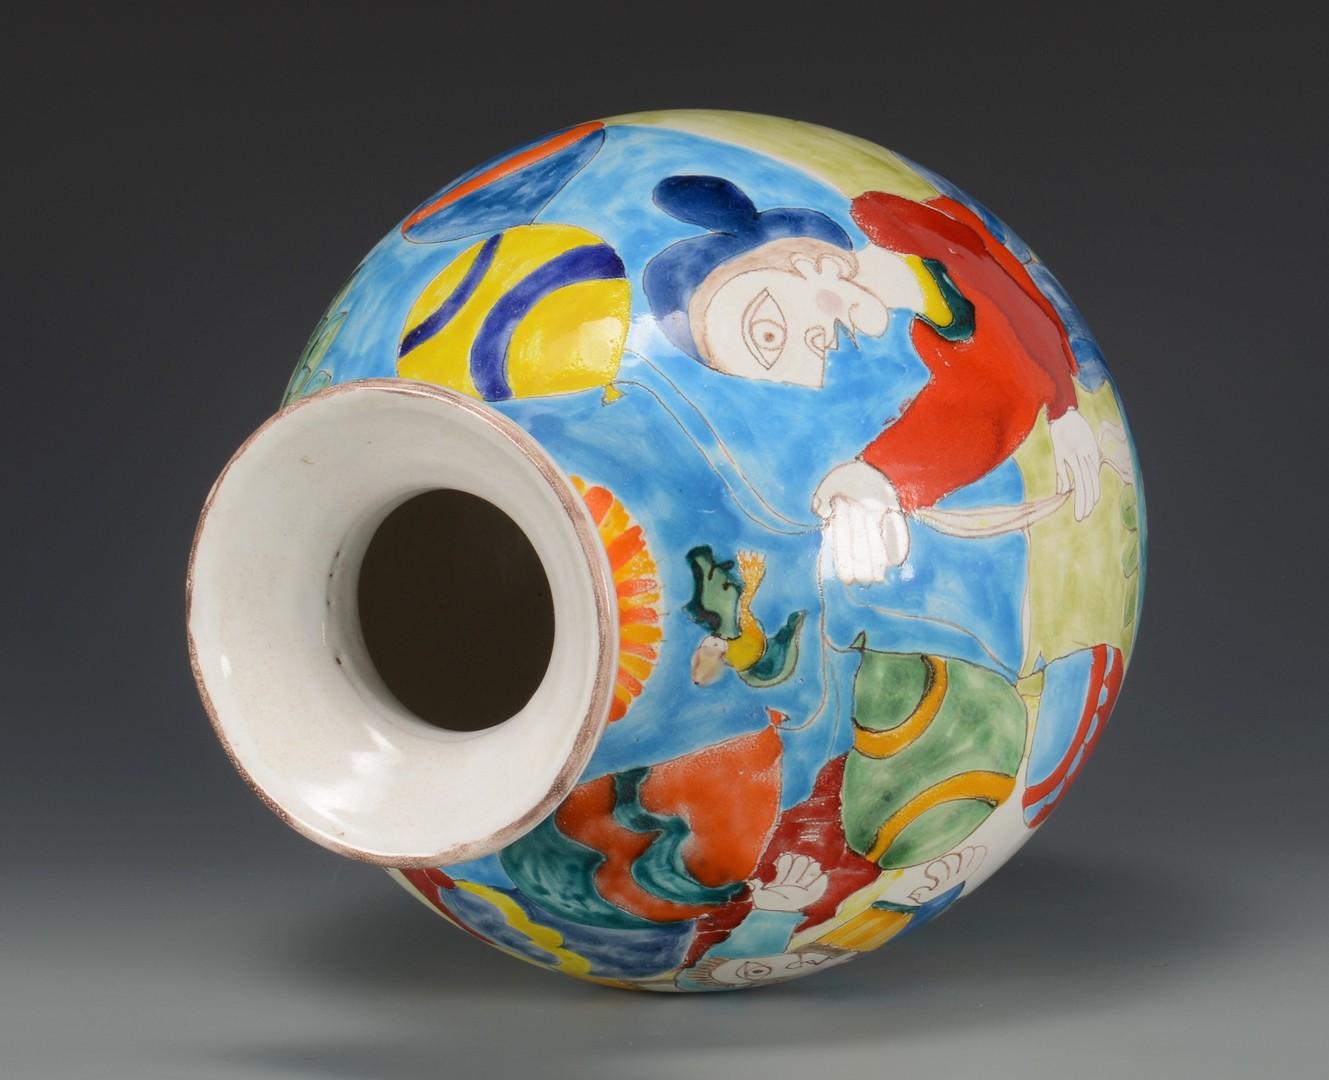 Lot 3832439: 2 Vases, Large Chinese & Italian Mid-century